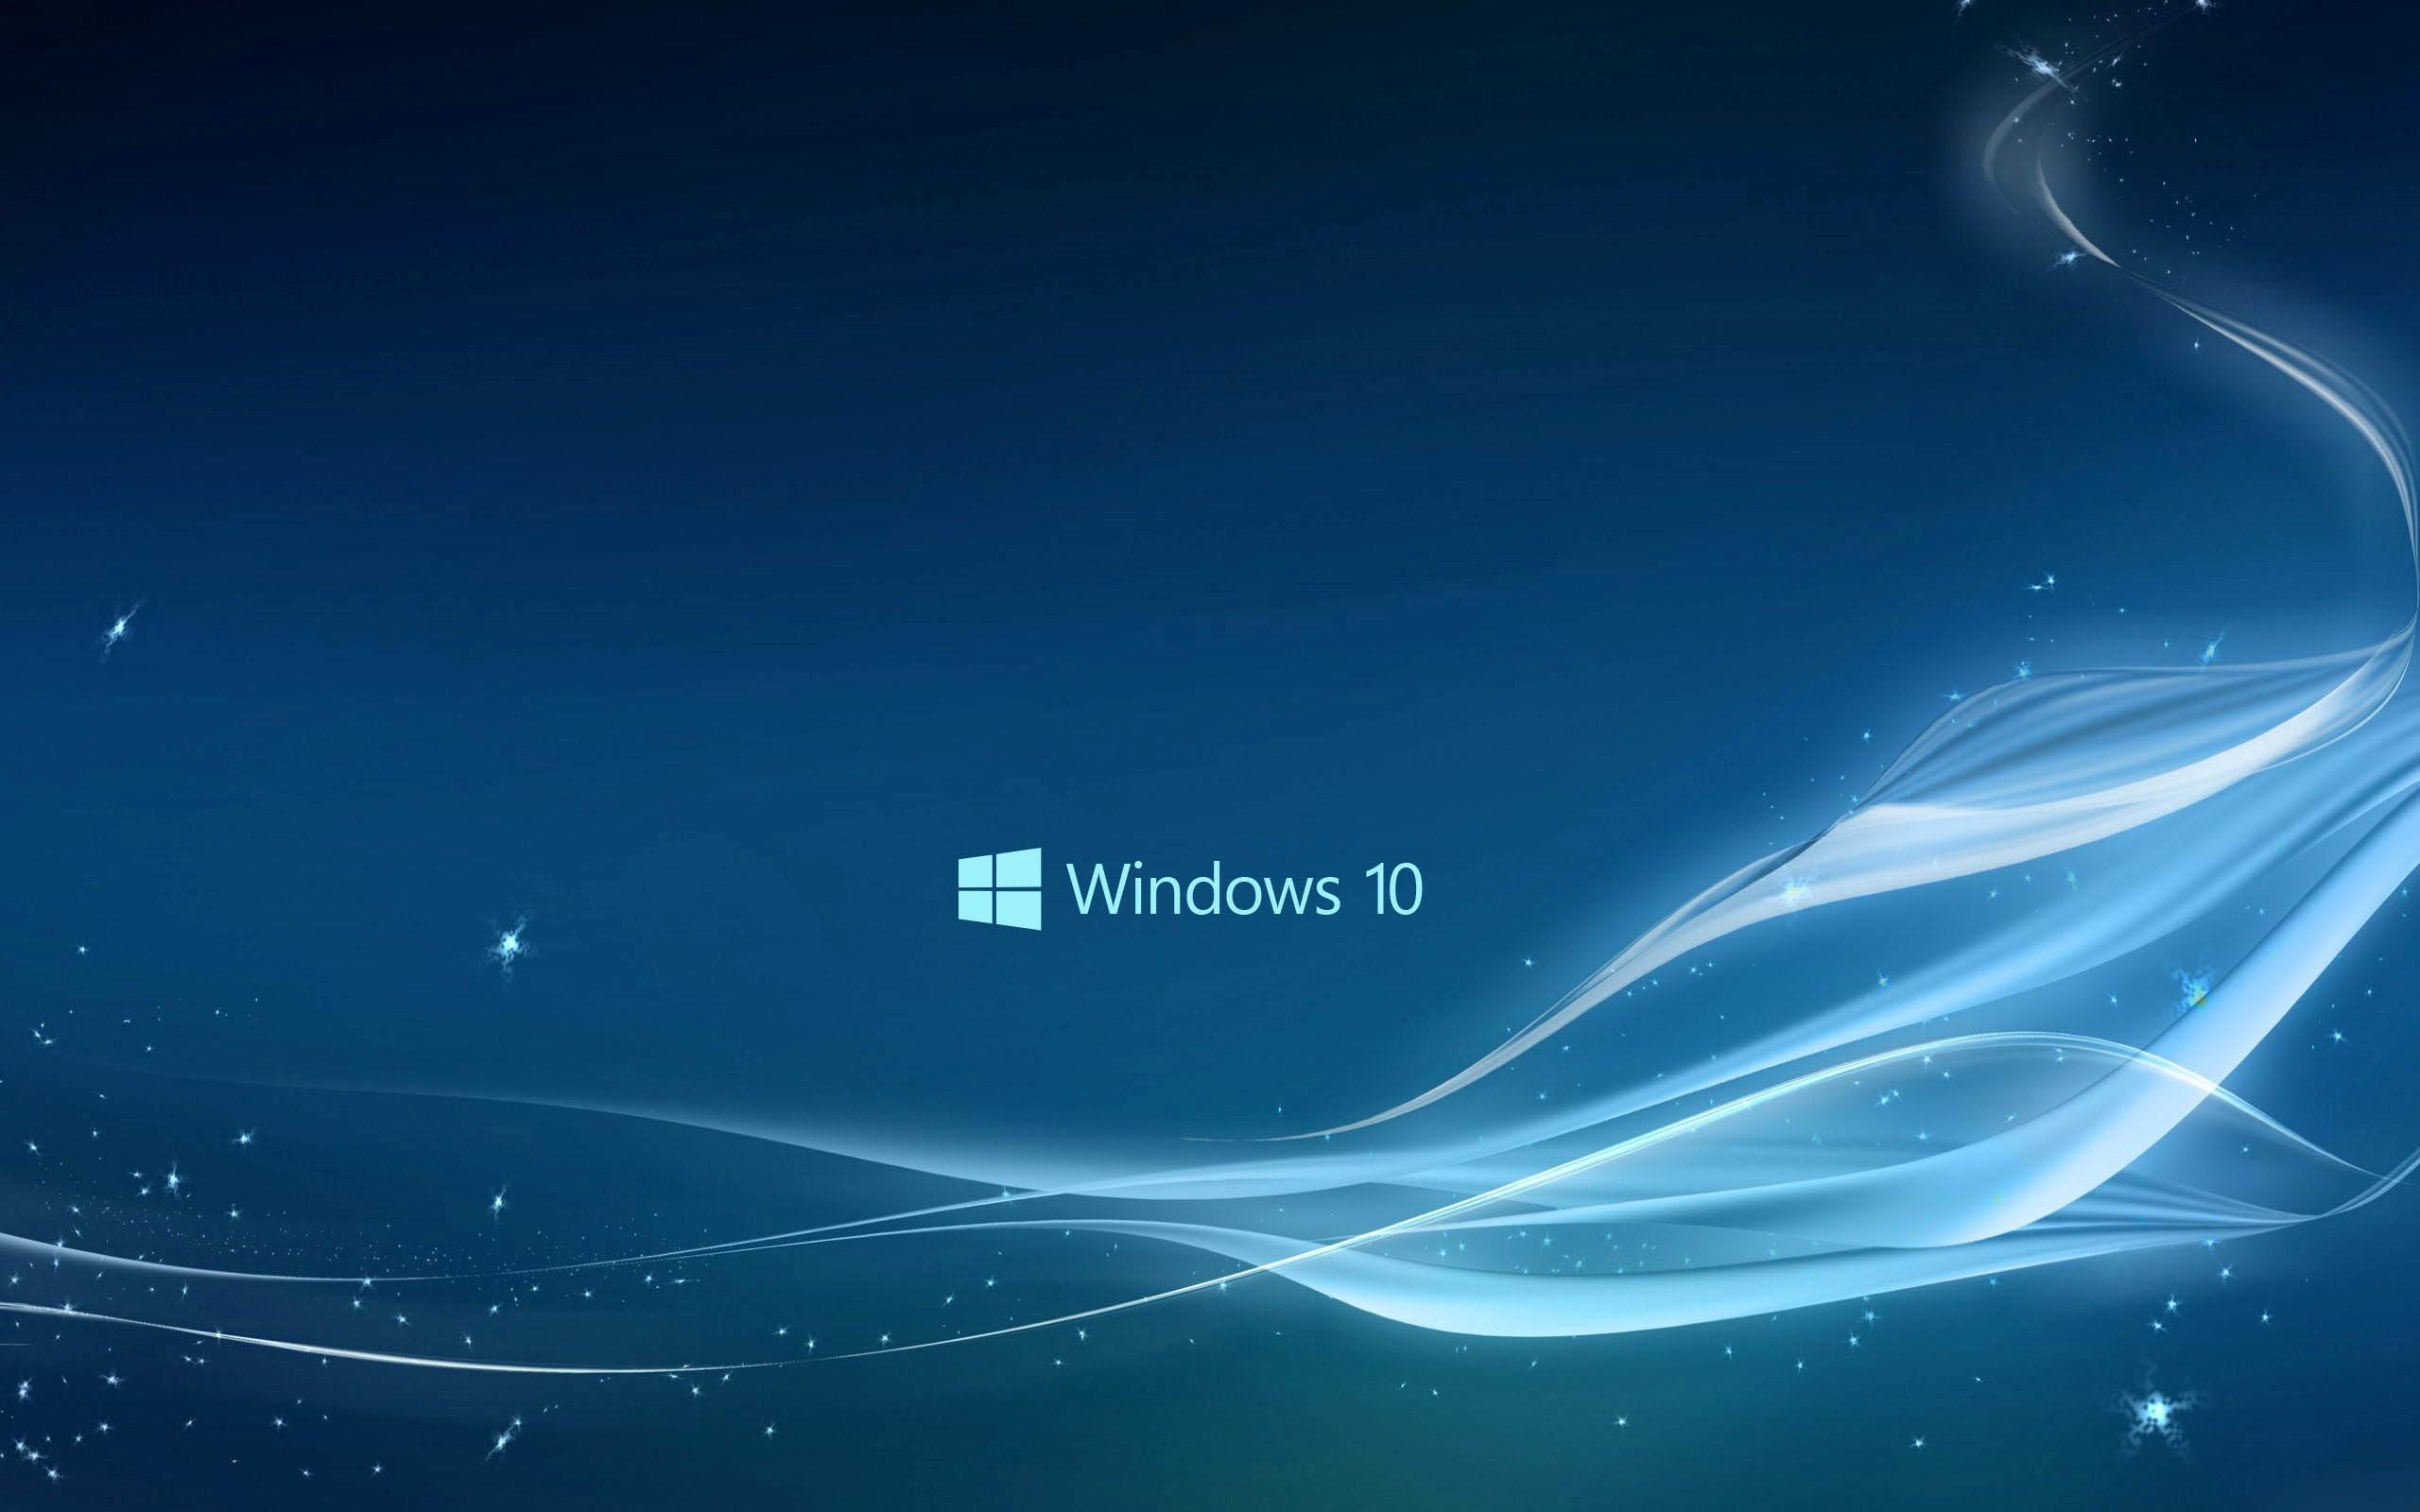 Windows 10 New OS Login Screen HD Wallpapers HD Famous Wallpapers 2560x1600